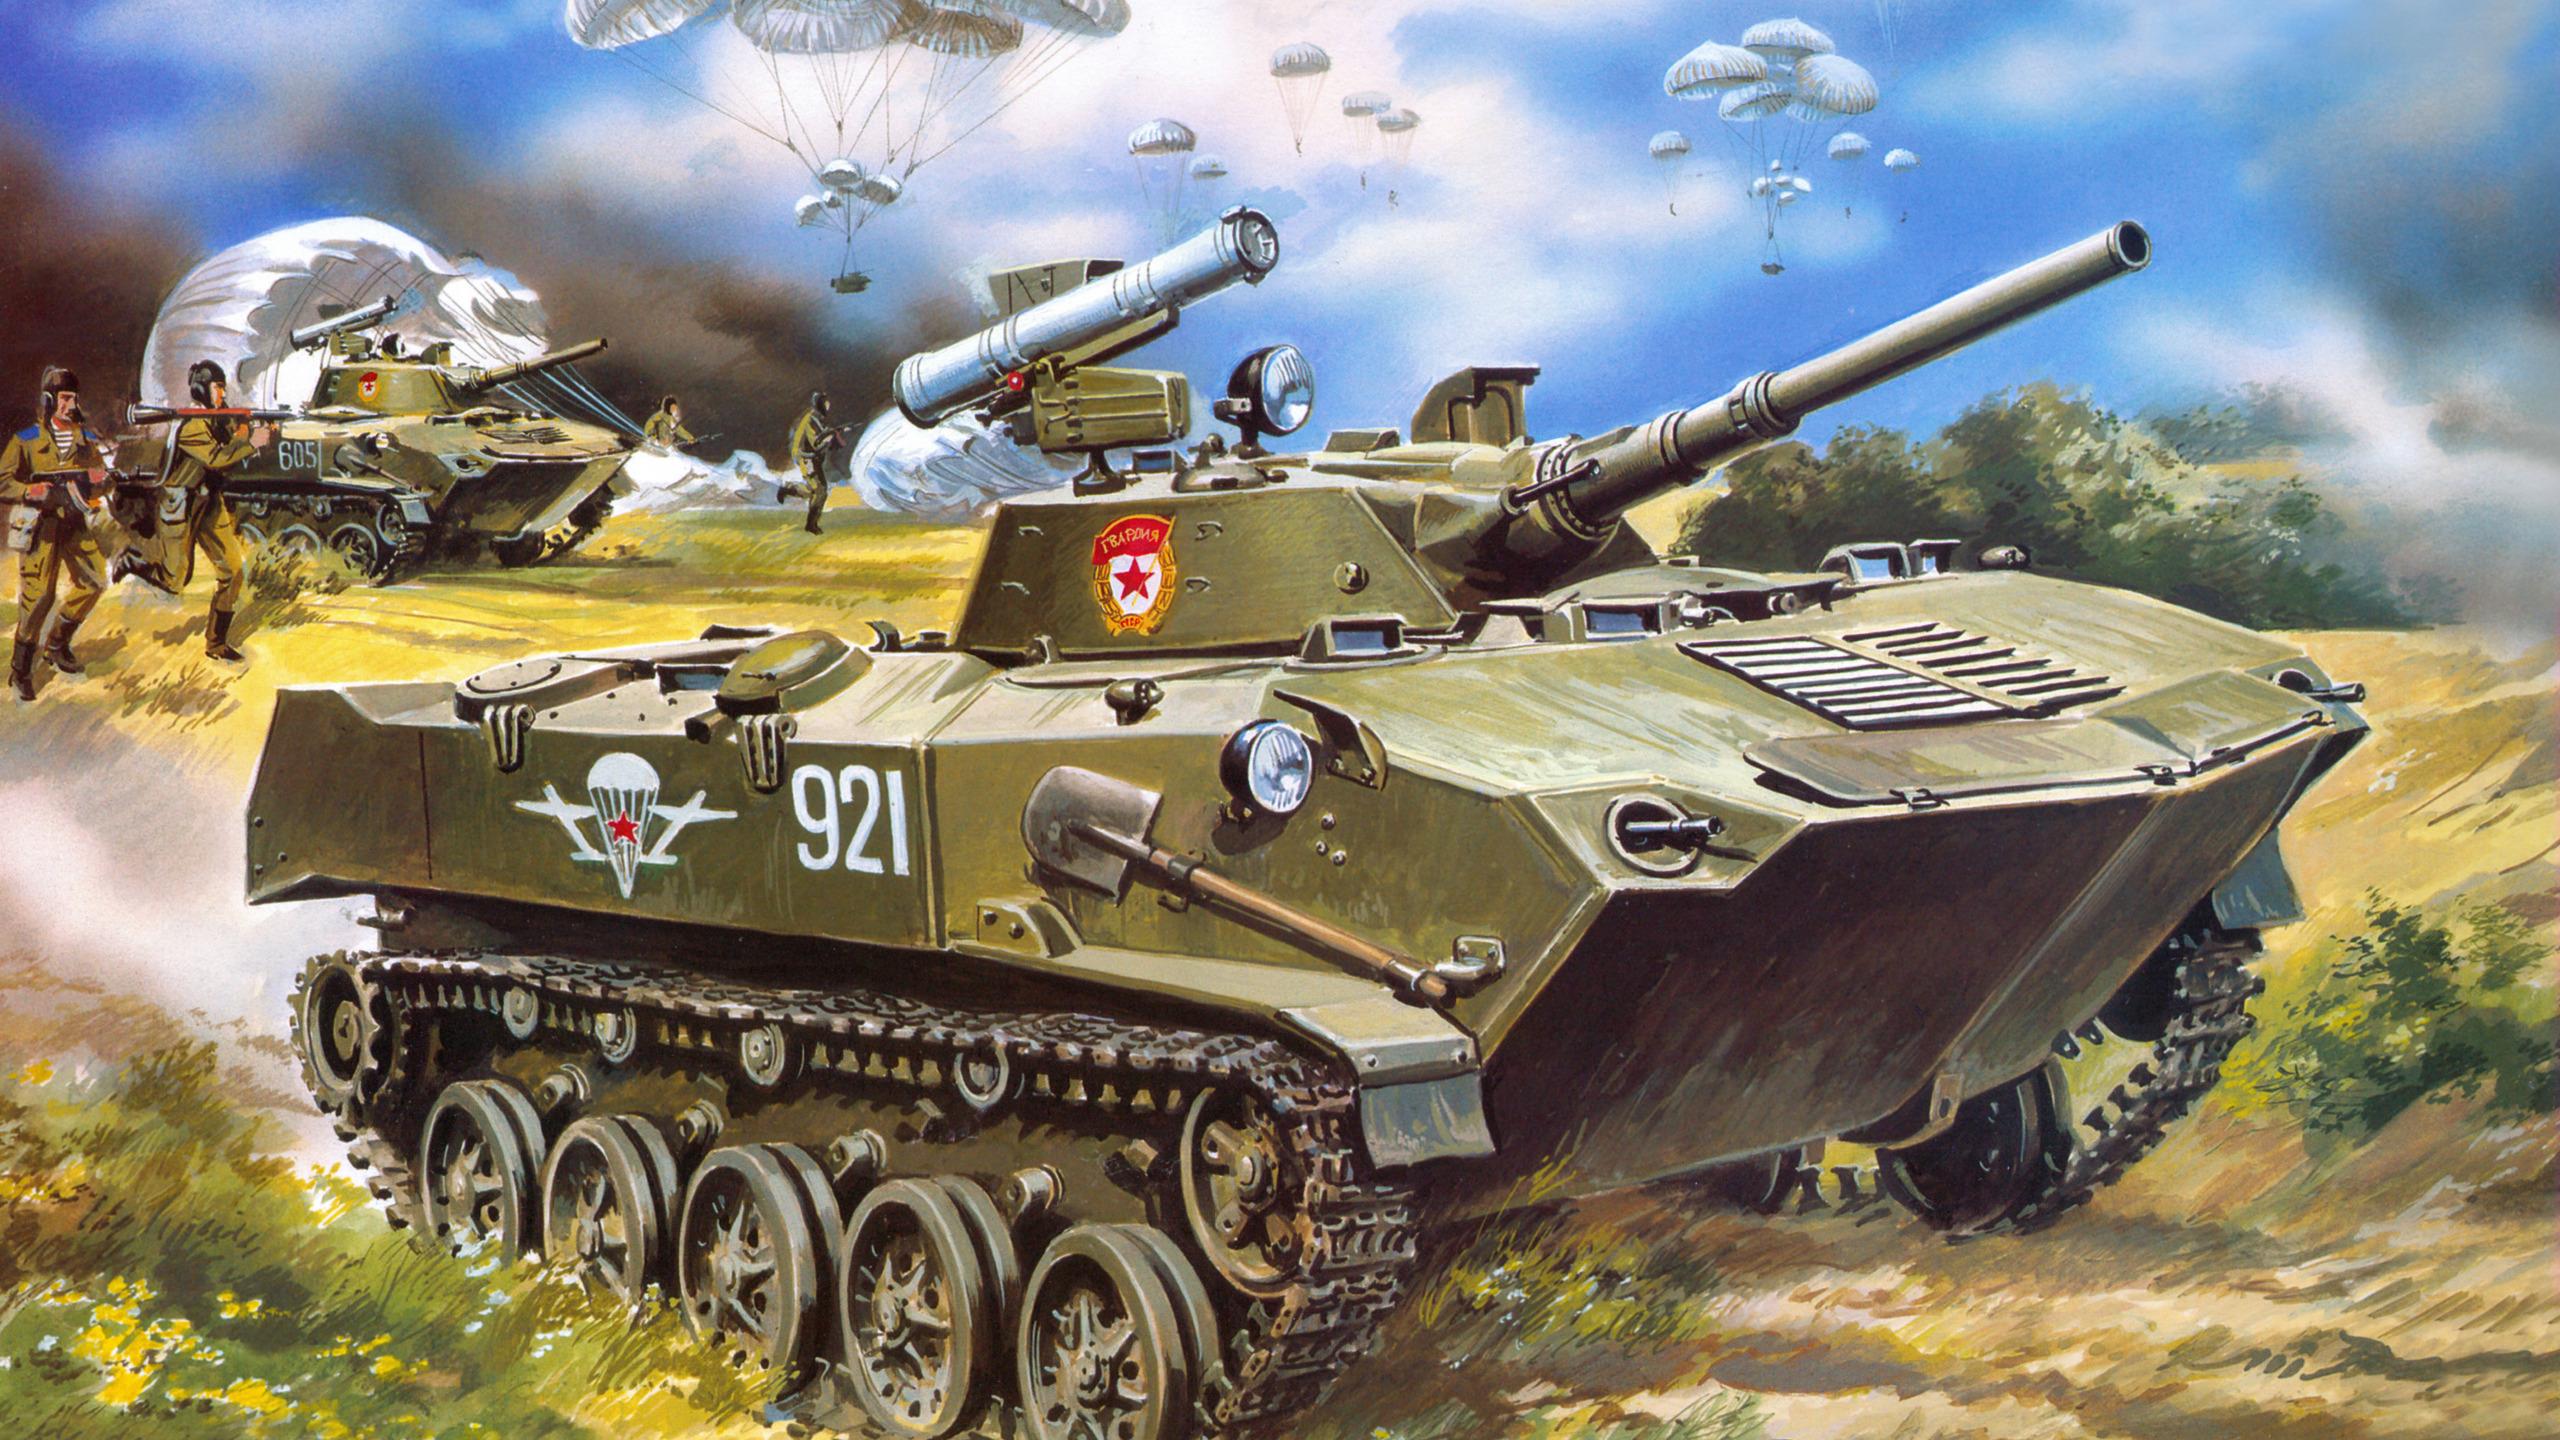 Яндексе танцы, открытки с танком